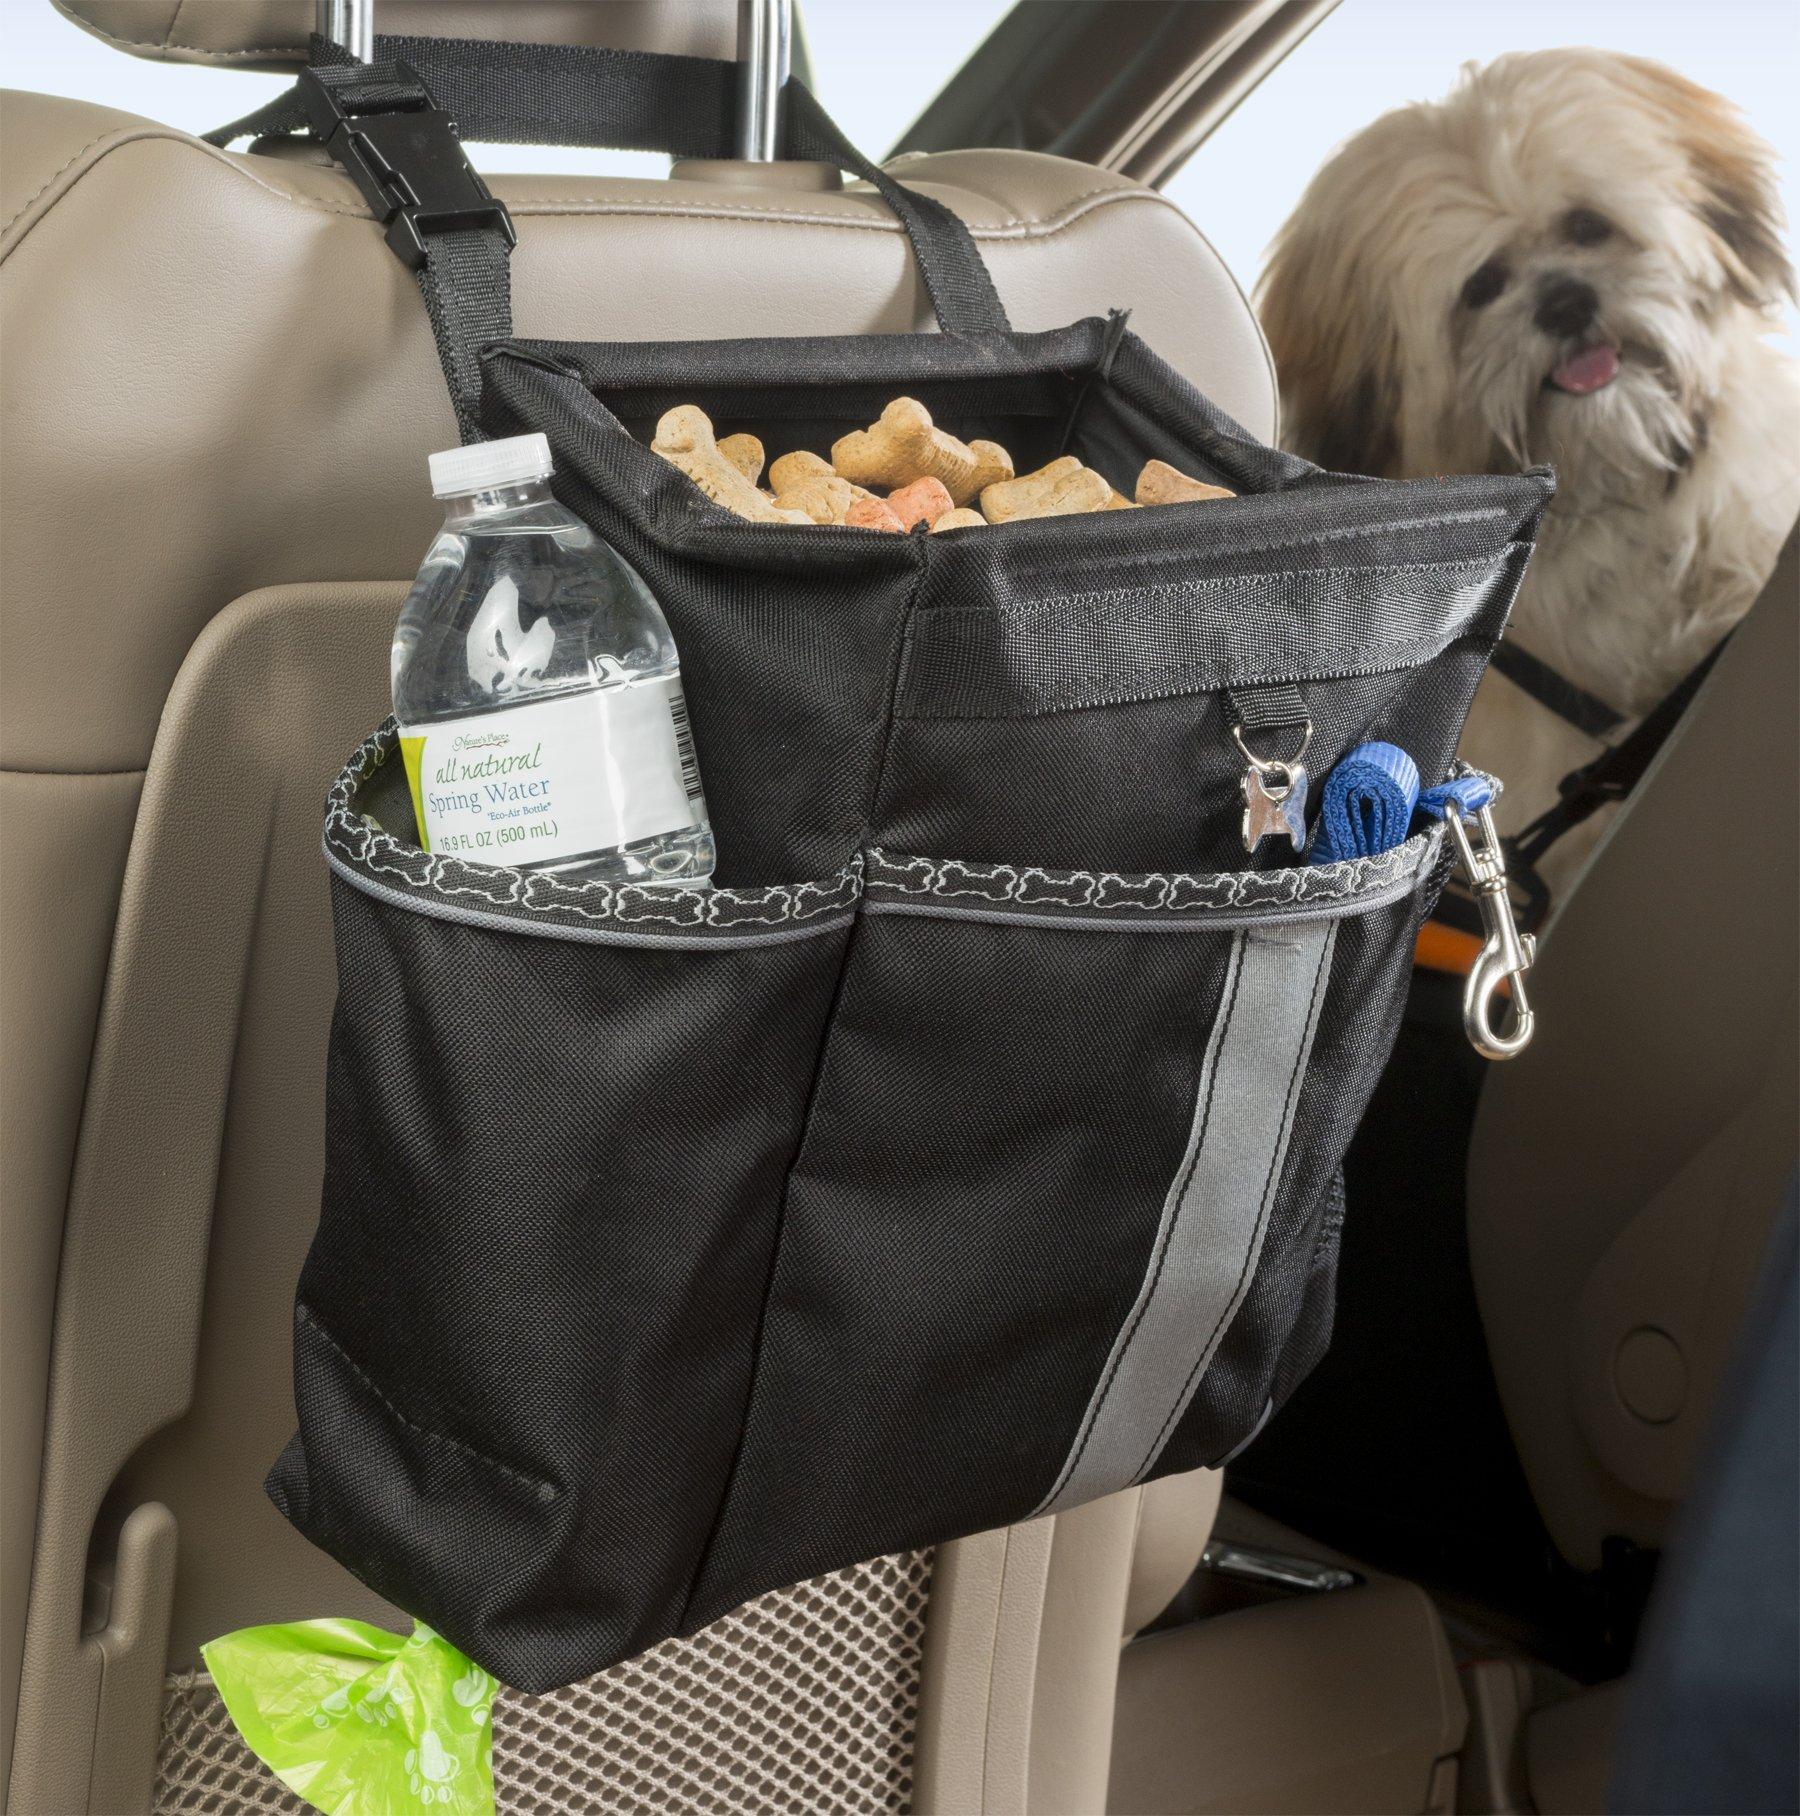 High Road Wag'nRide Dog Car Seat Organizer with Waste Bag Dispenser